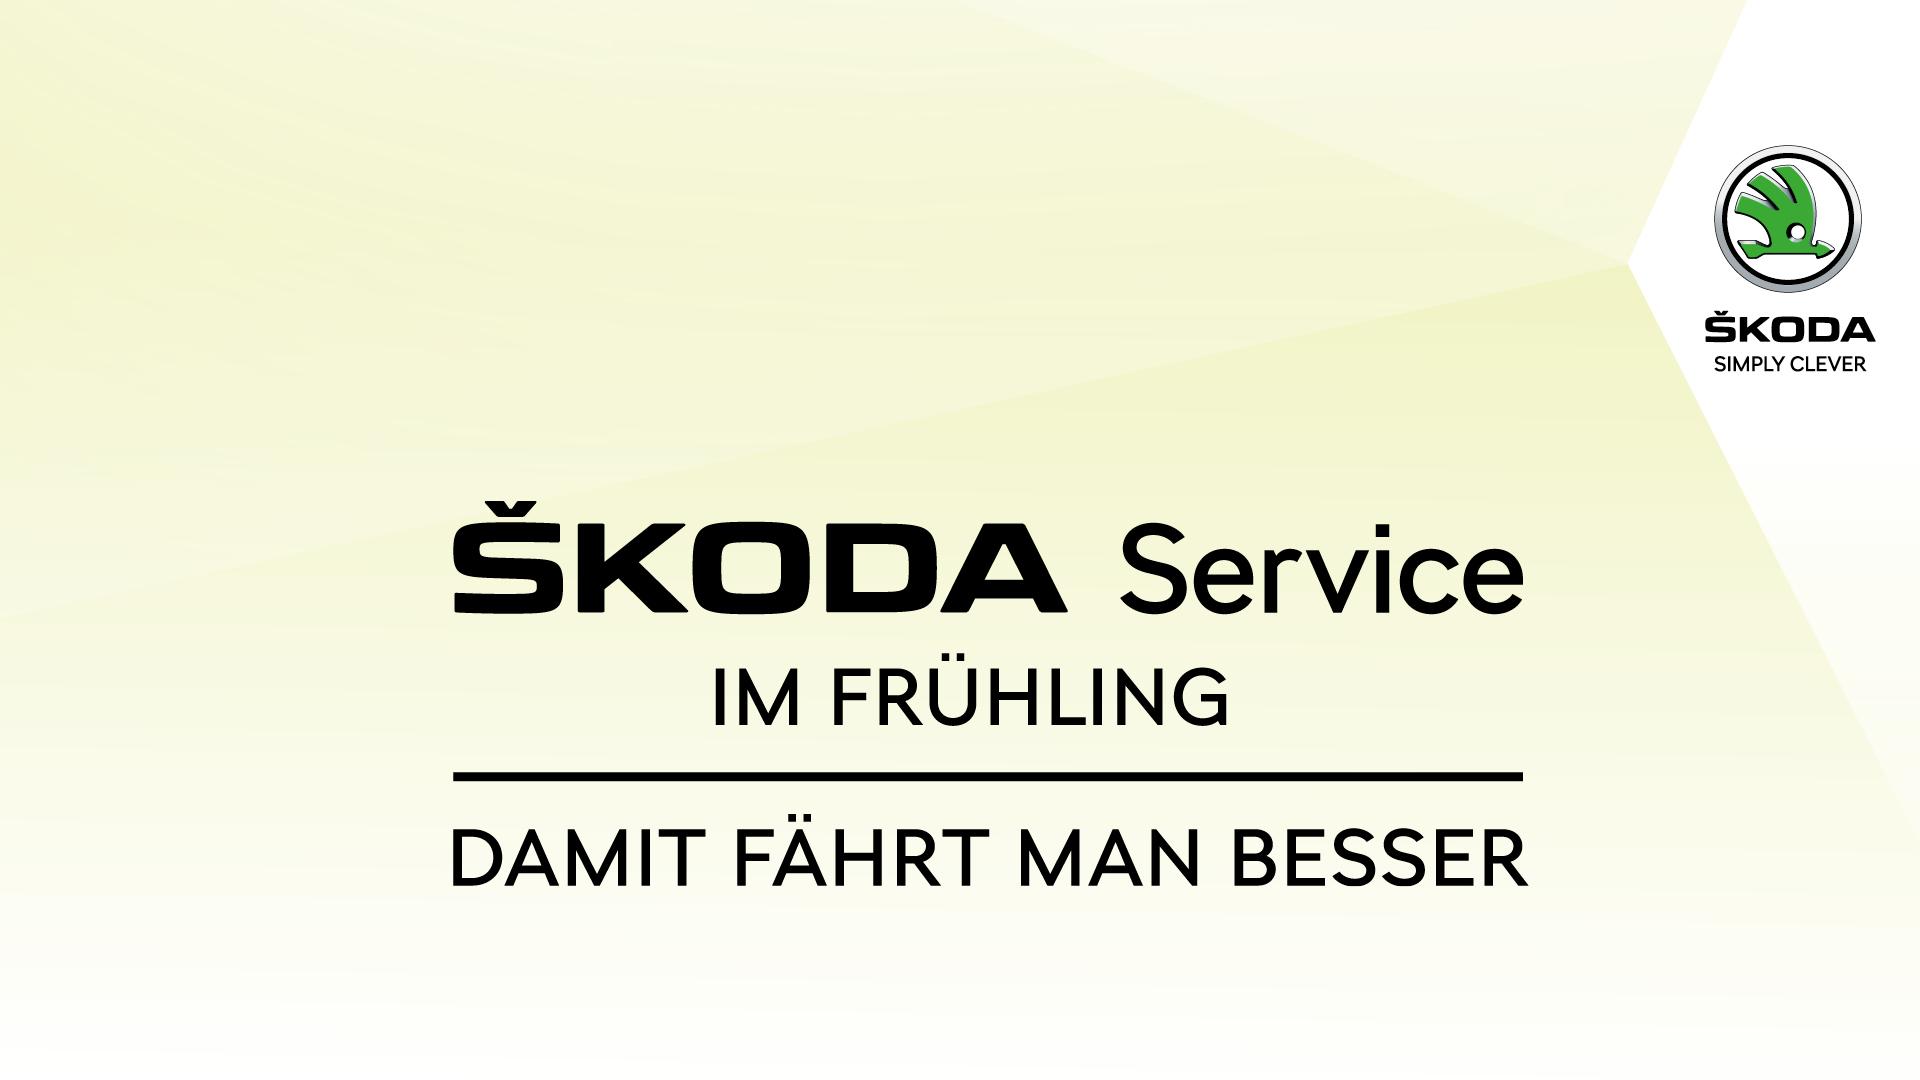 ŠKODA SERVICE IM FRÜHJAHR